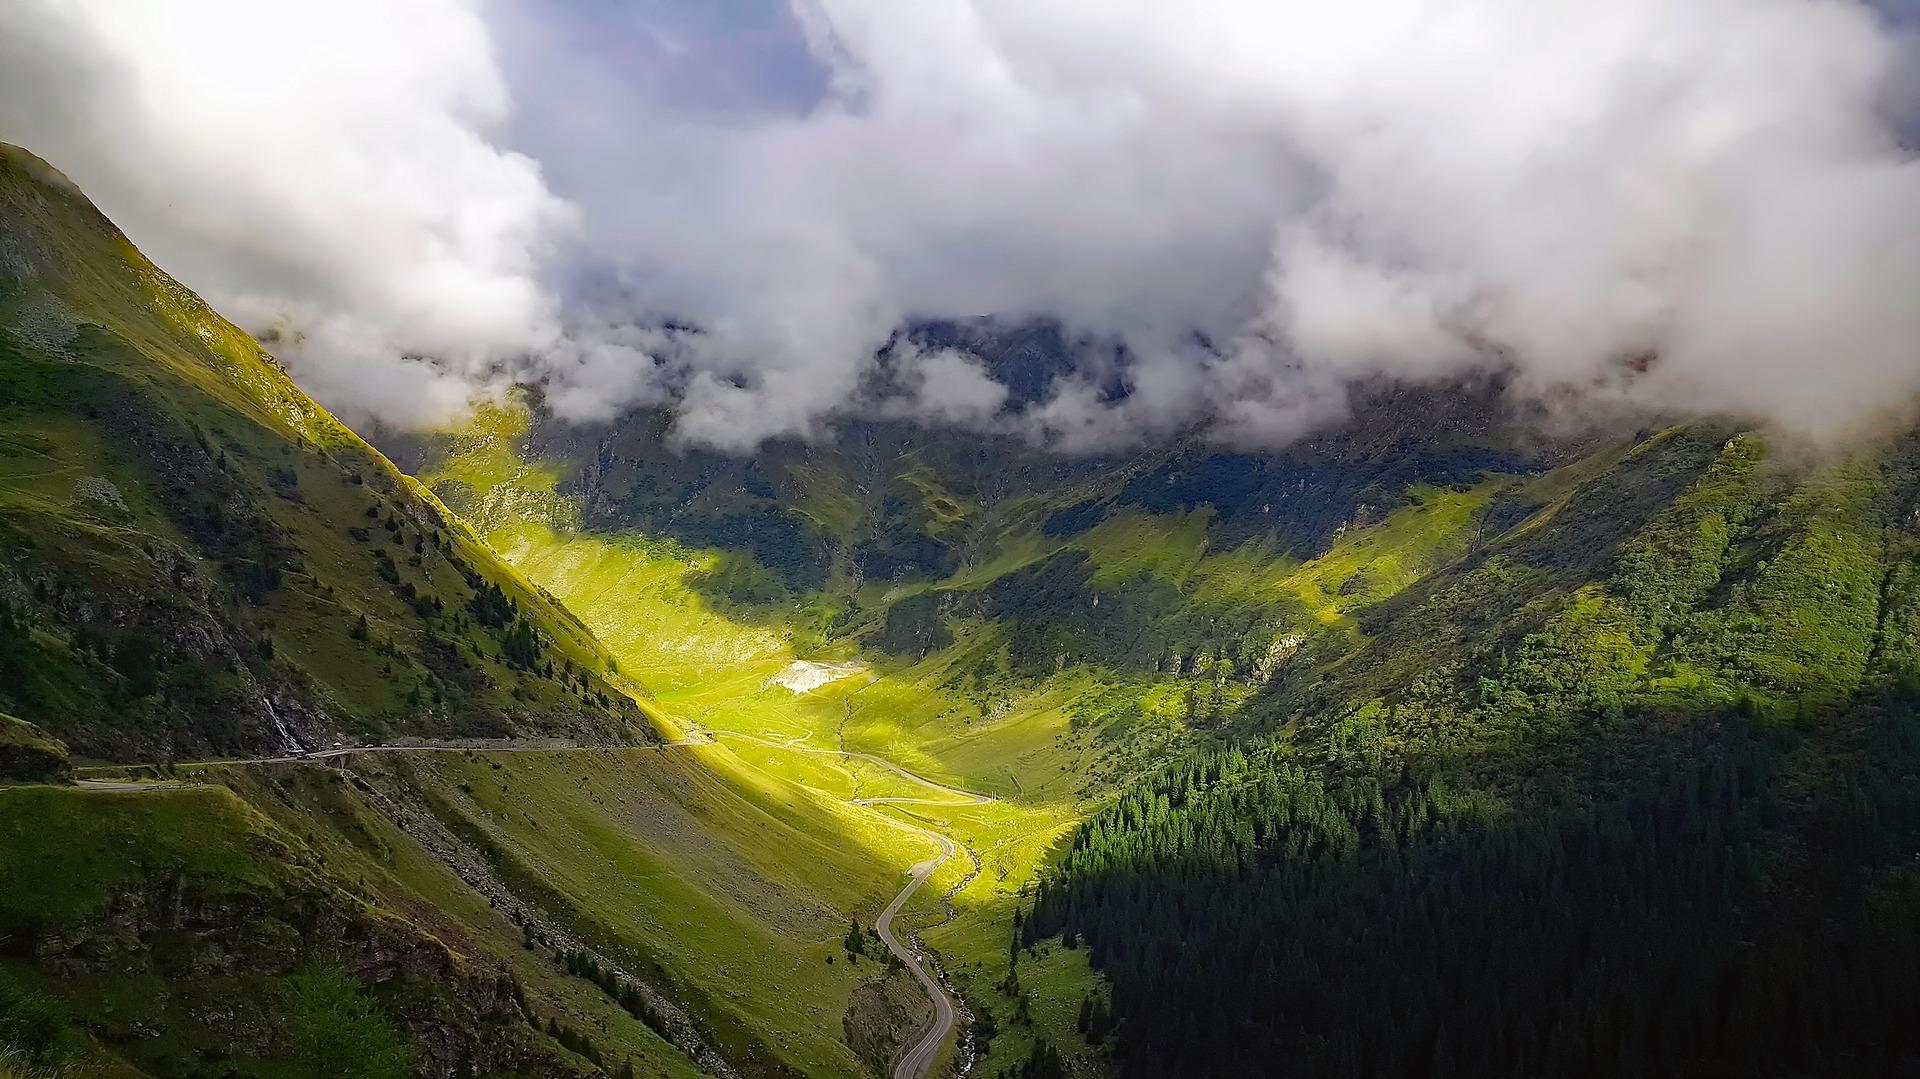 Landschaft um der Stadt Sinaia herum - Berglandschaft in Rumänien